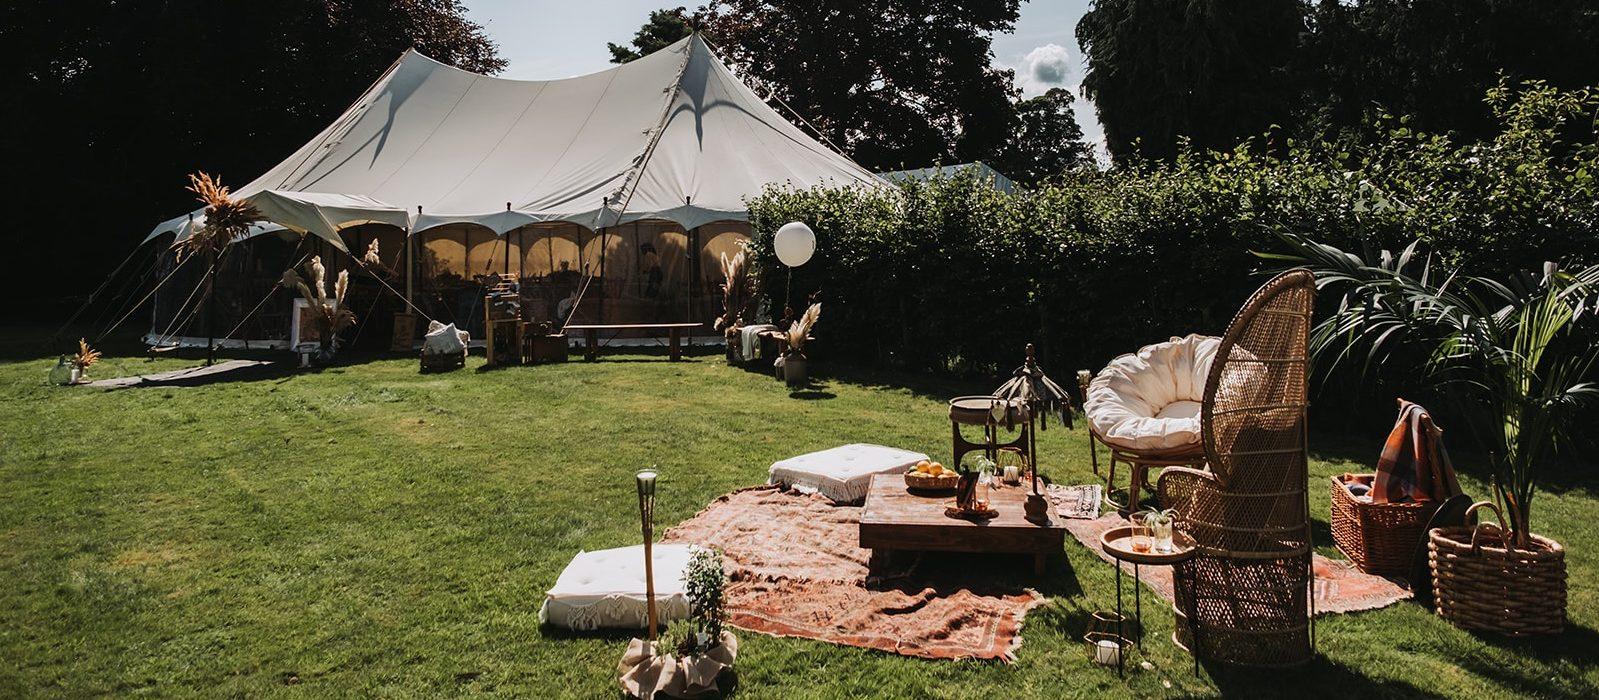 Outdoor wedding at Barolin Farm, in North Yorkshire